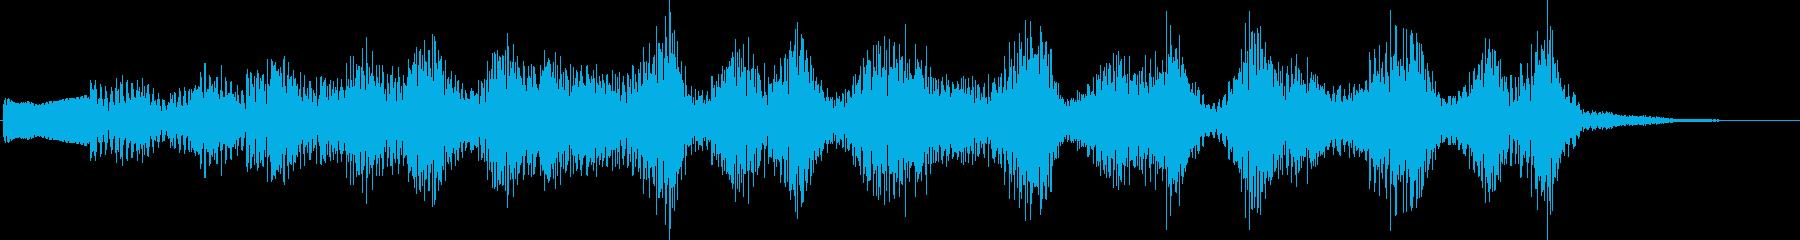 KANT考えてる時の音効果音08311の再生済みの波形